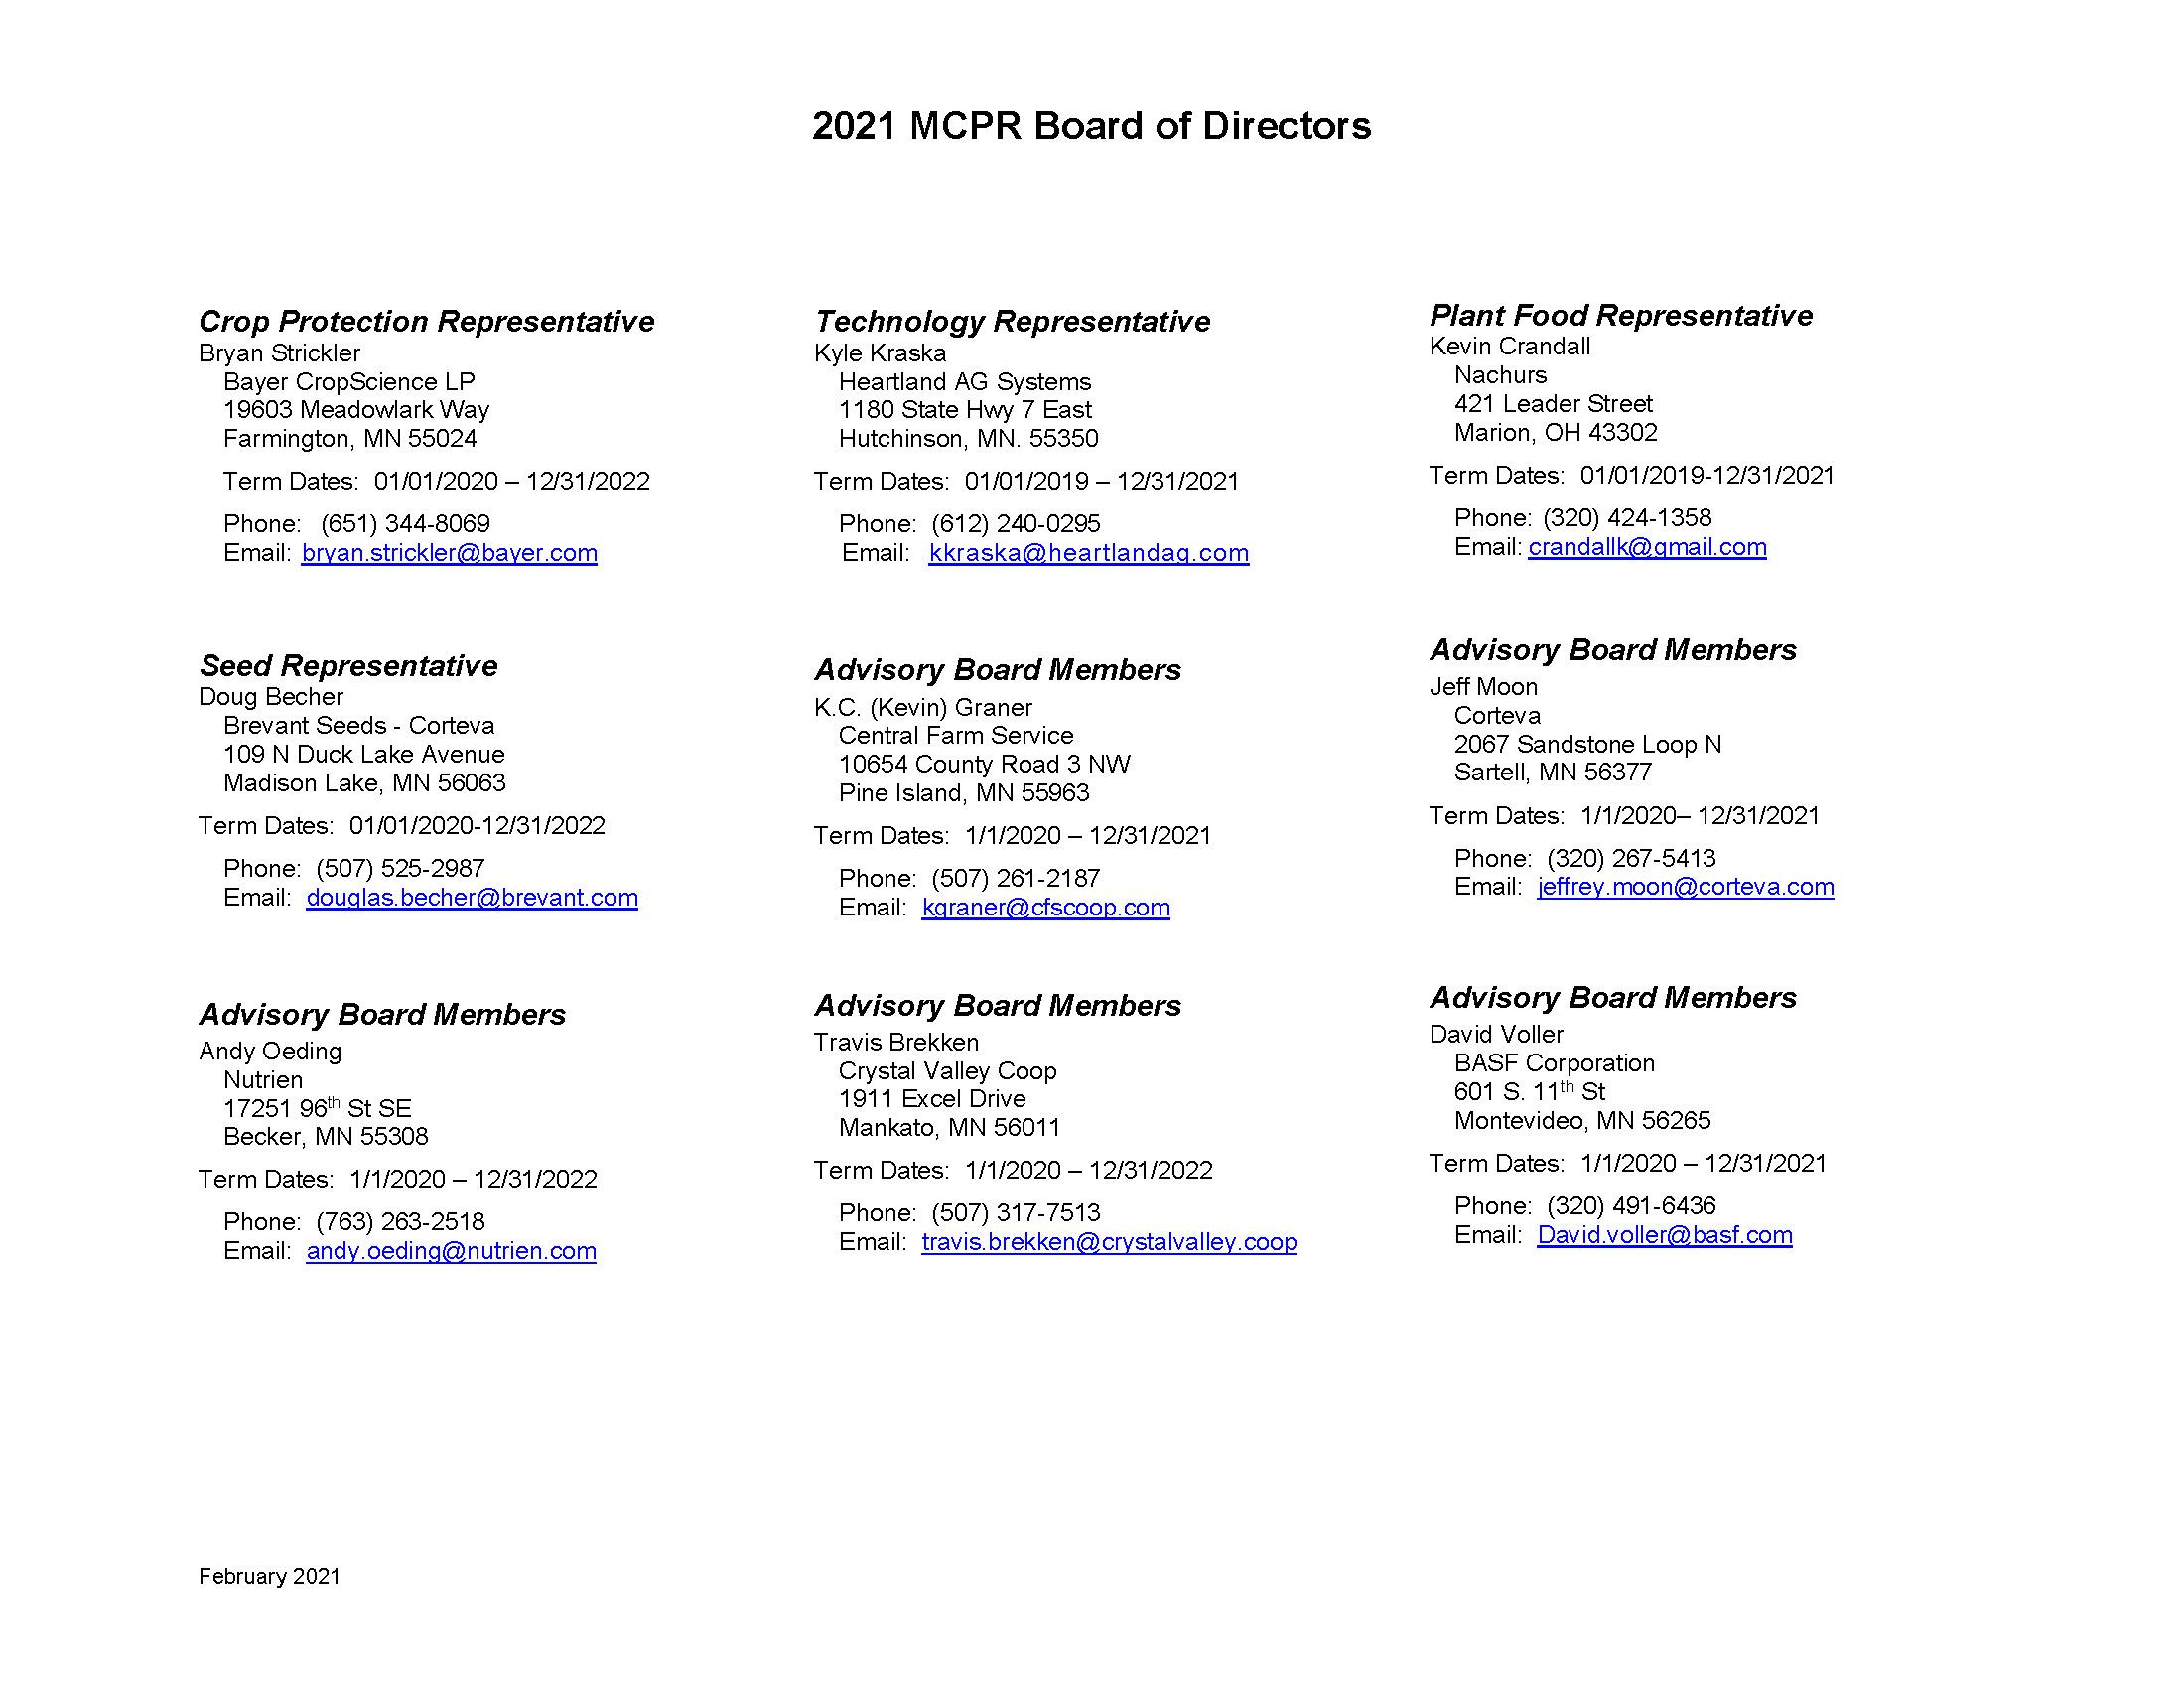 2021 MCPR Board of Directors_Feb_Page_2